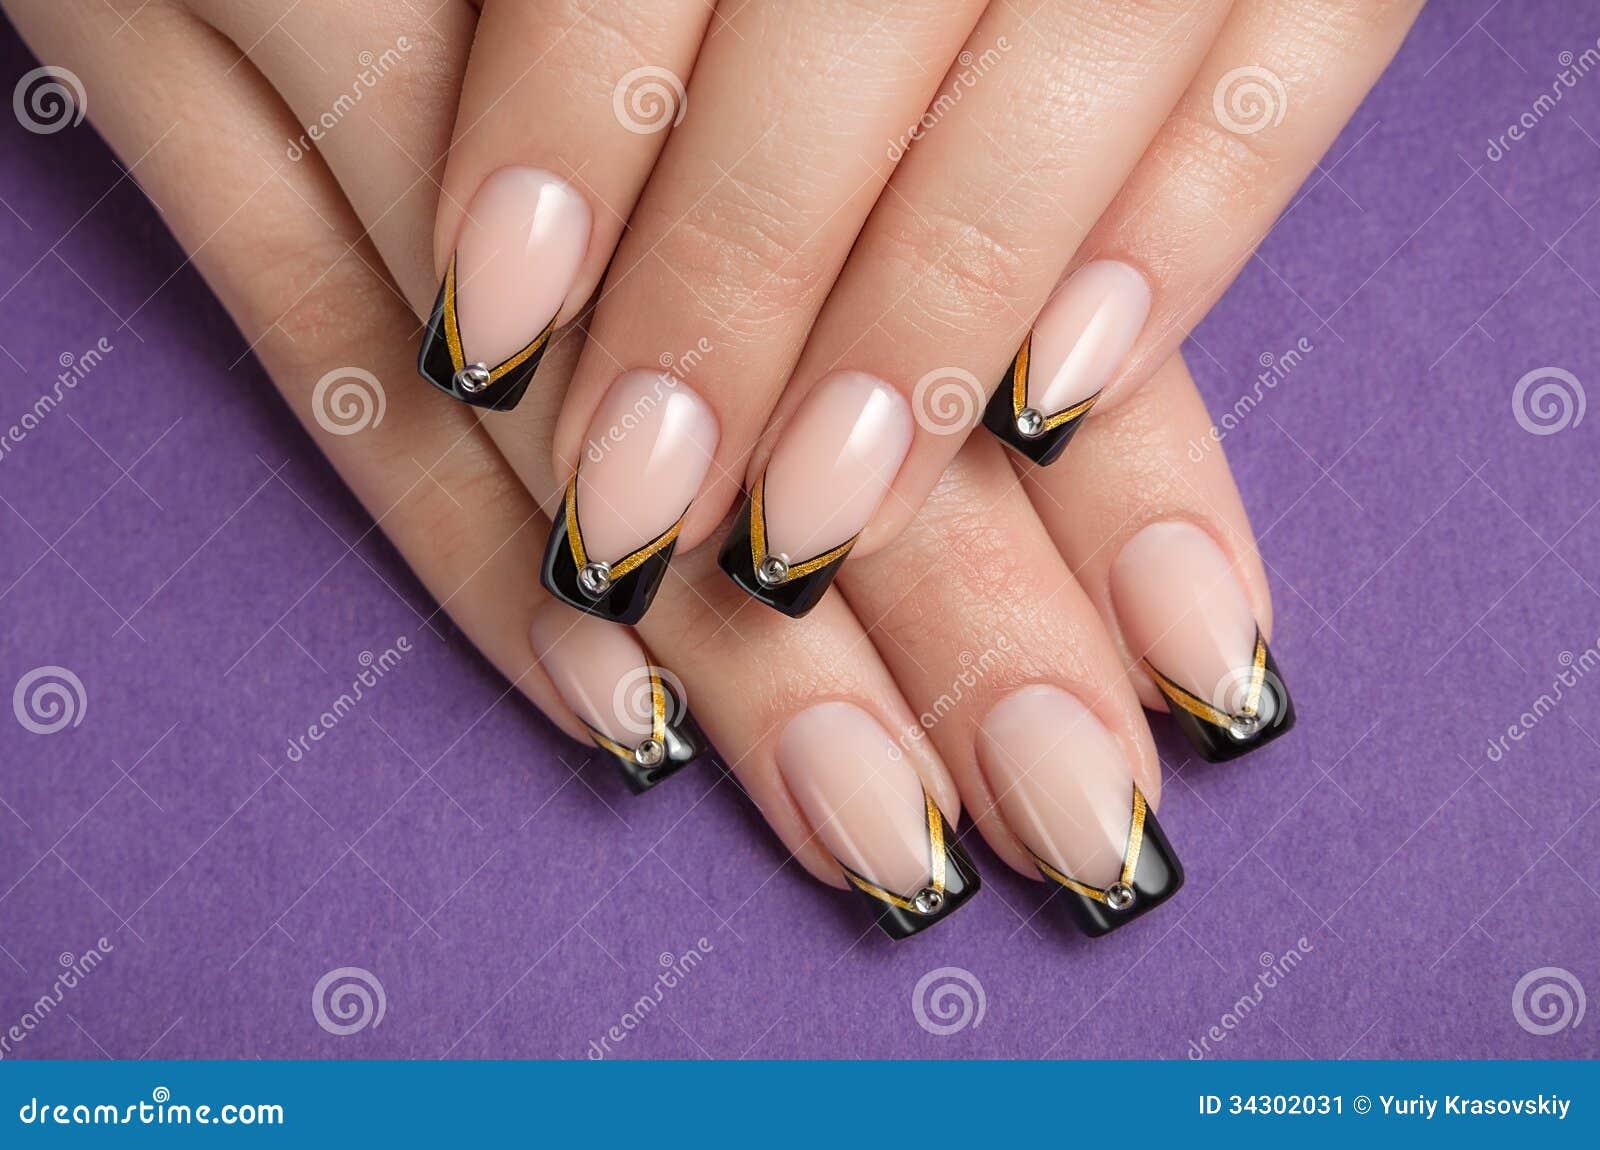 Fingernails With Black French Manicure Stock Image - Image of ...